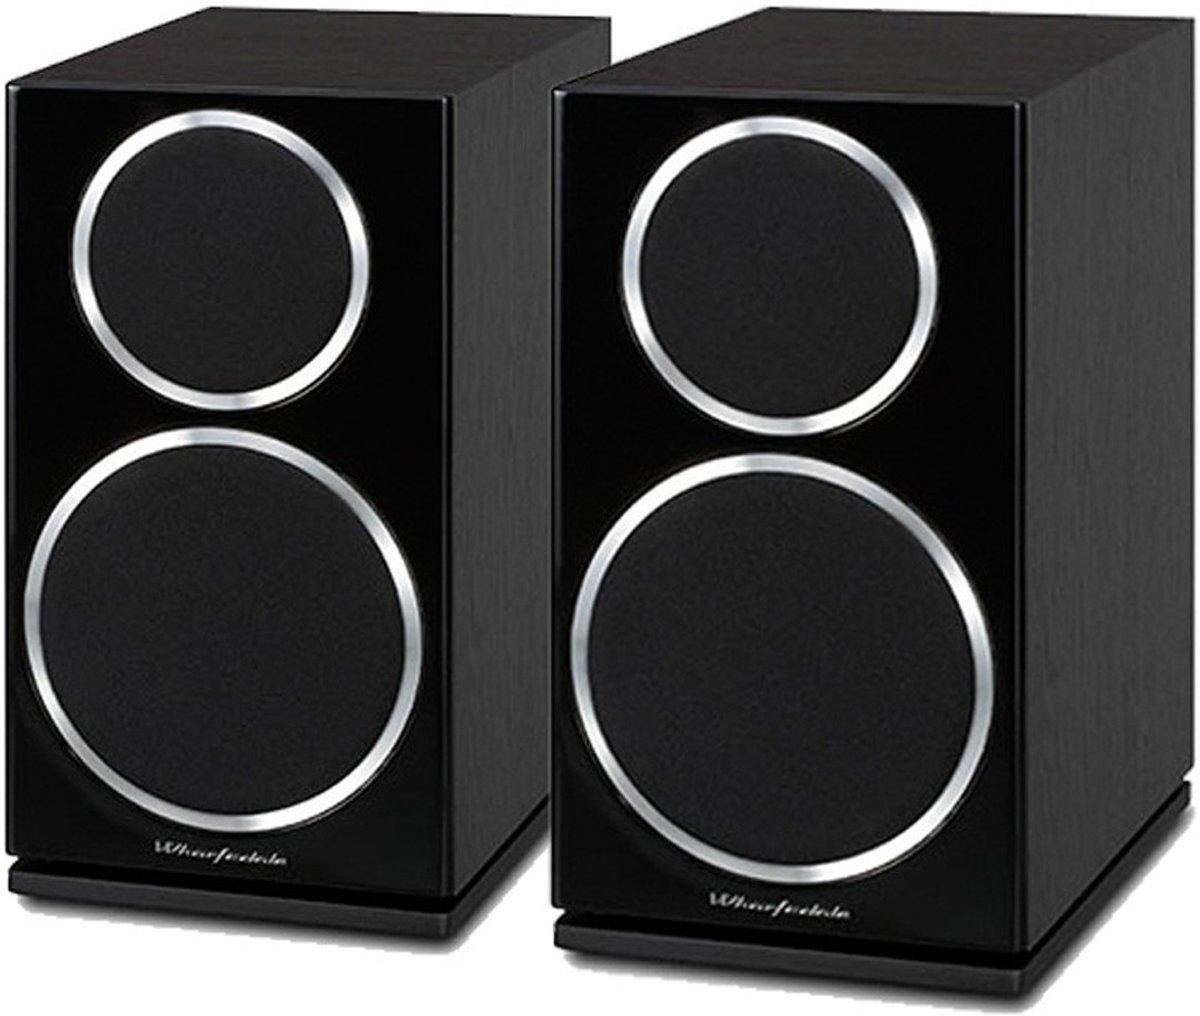 Wharfedale Diamond 210 - Boekenplank speakerset - Zwart kopen